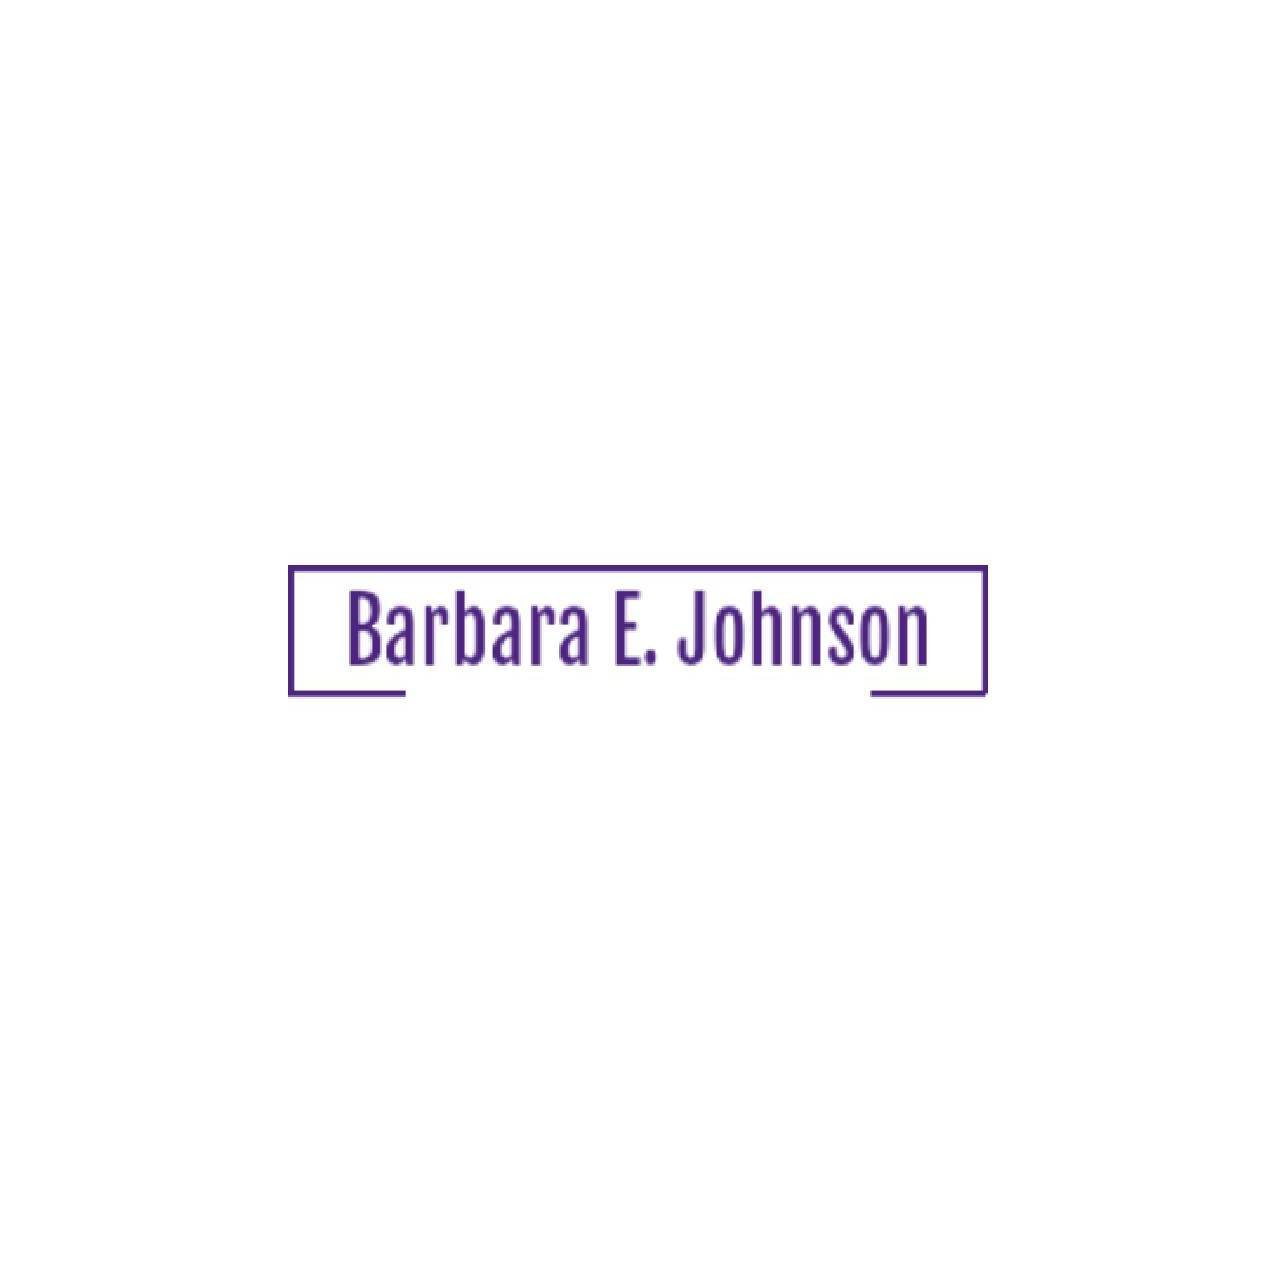 Barbara E. Johnson